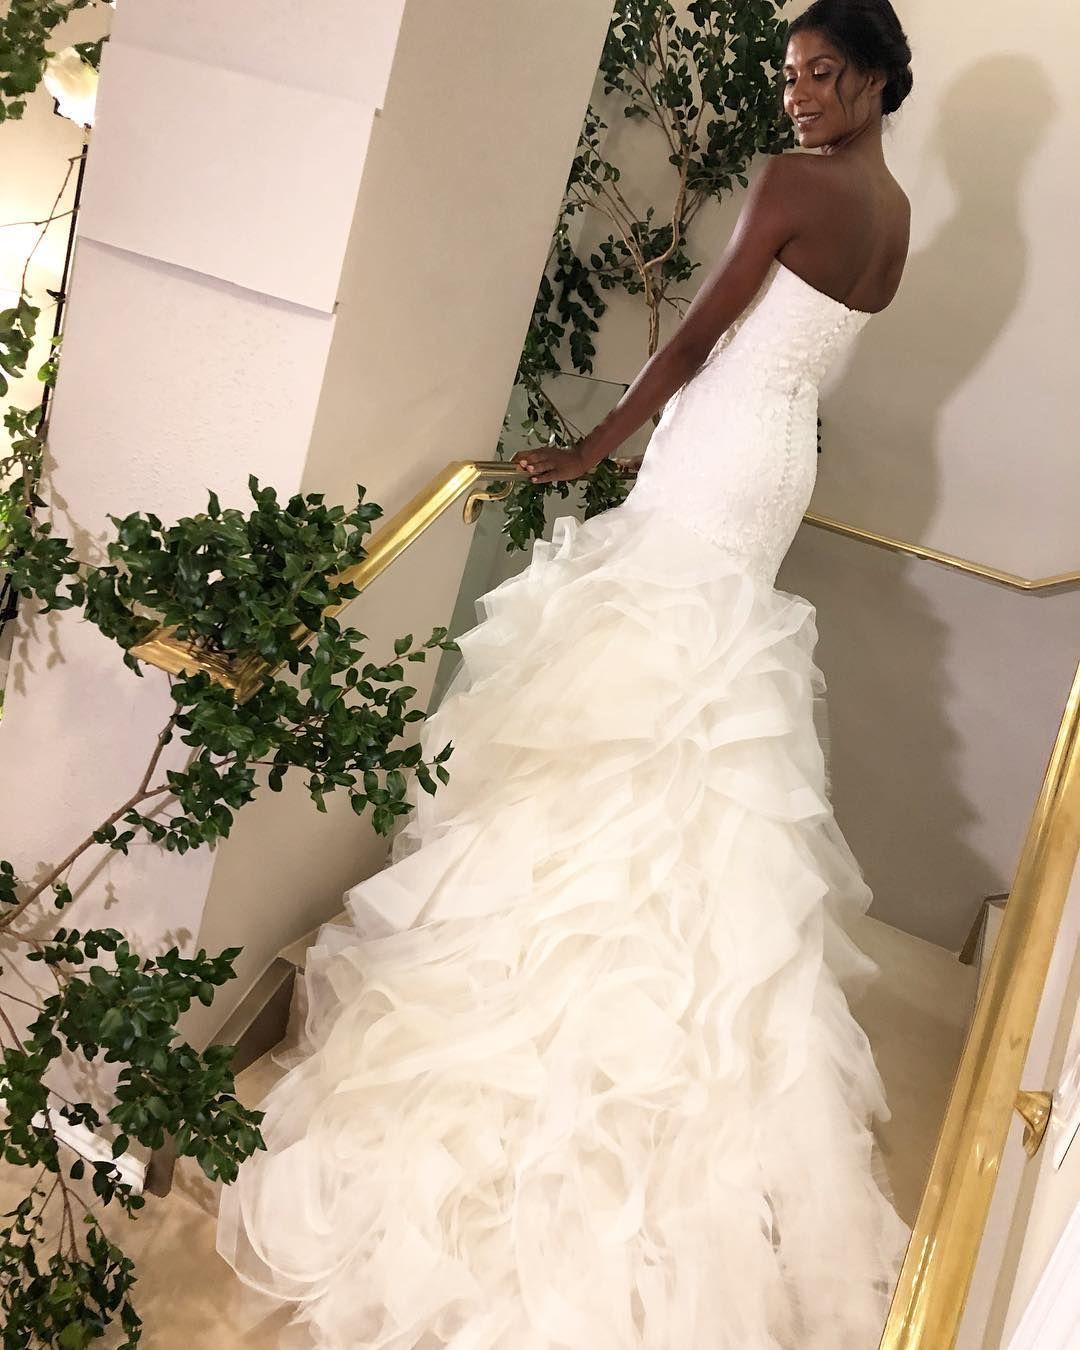 Strapless mermaid ruffled skirt wedding dress with long train